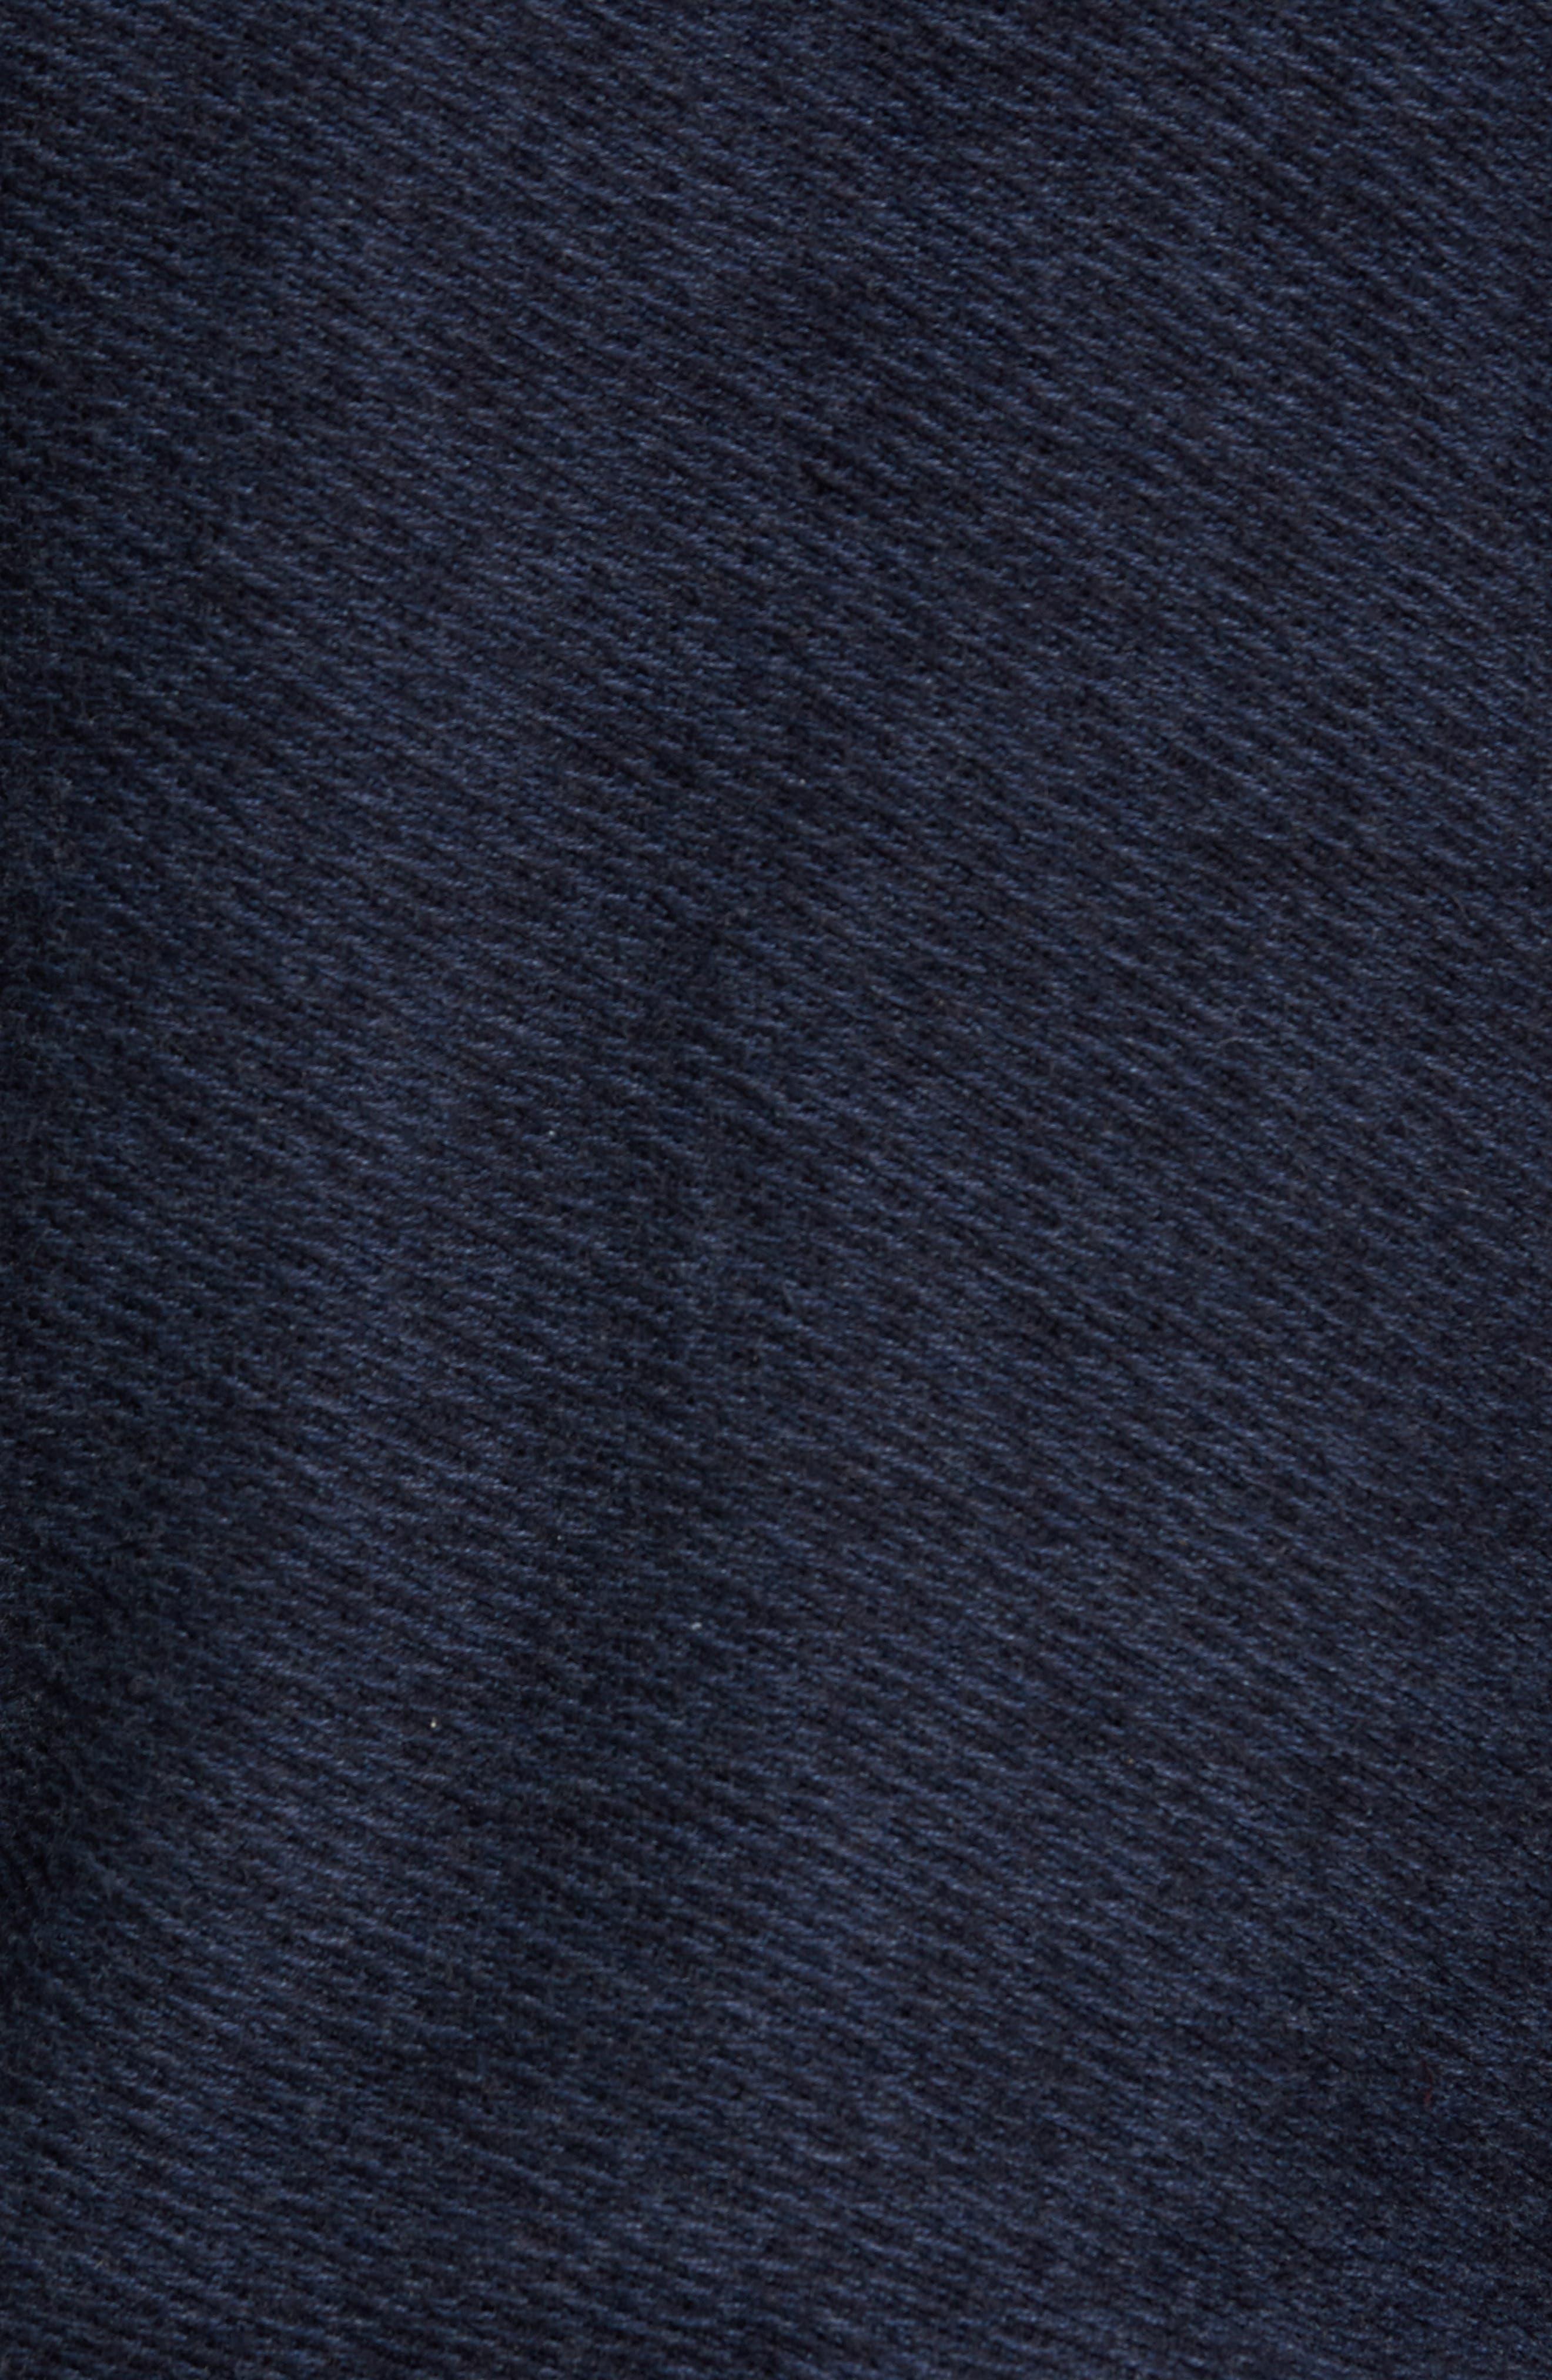 Cotton & Cashmere V-Neck Sweater,                             Alternate thumbnail 6, color,                             Navy Iris Melange